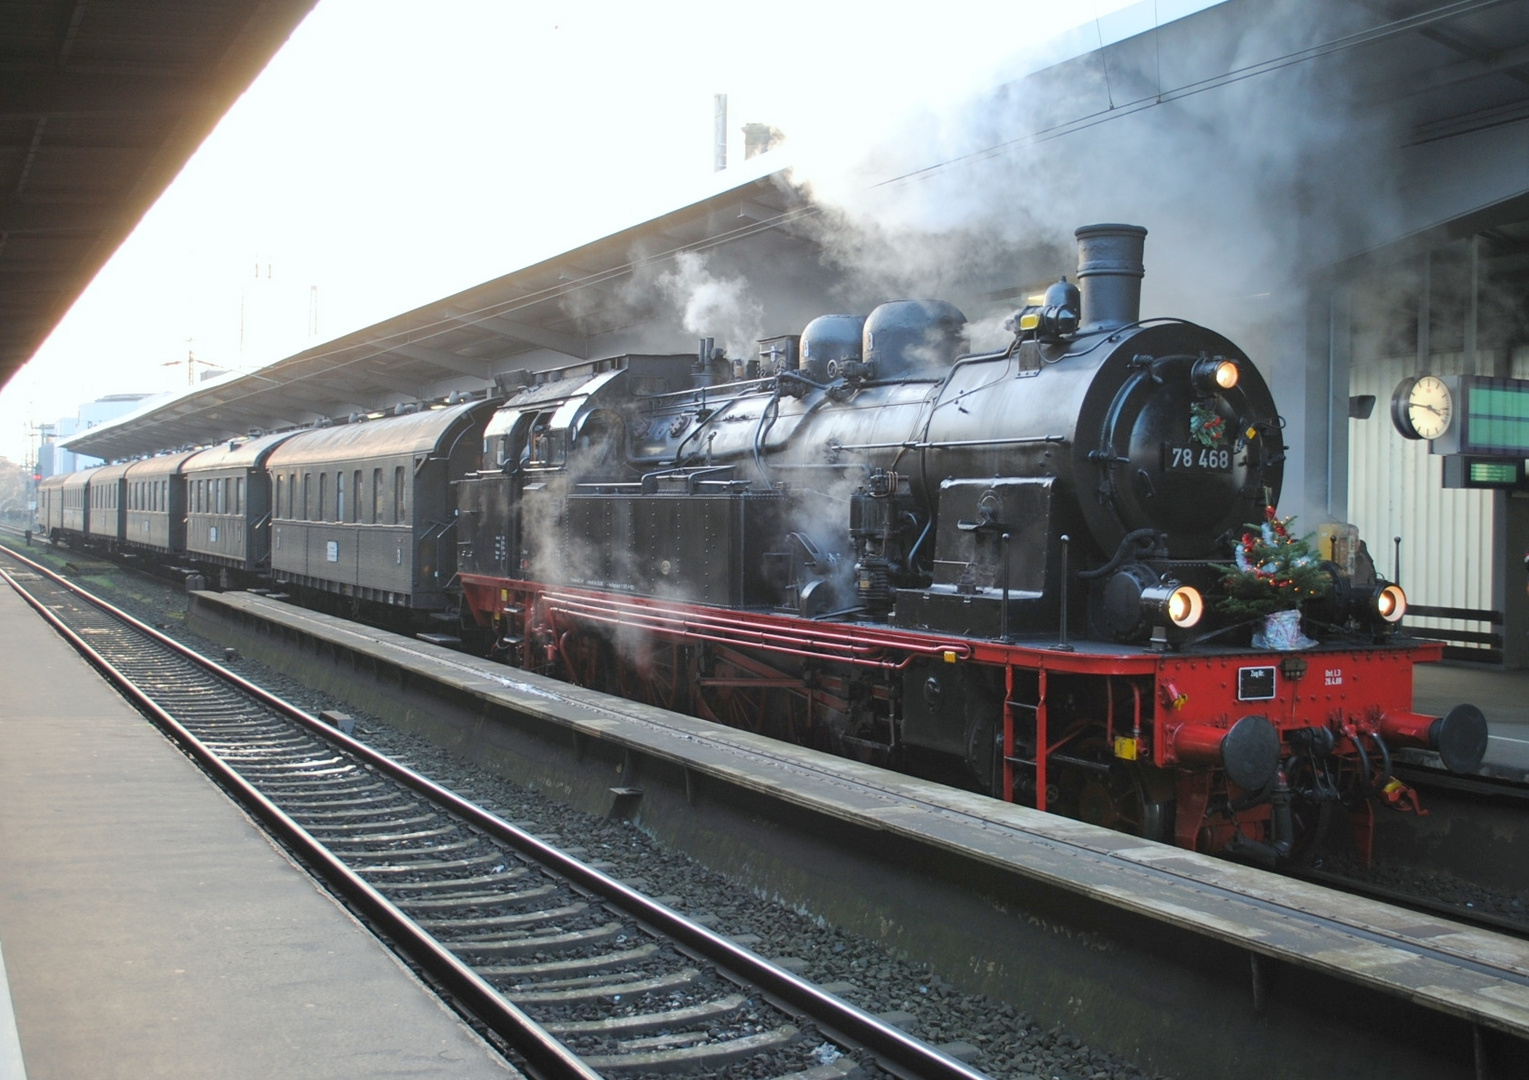 Nikolaus Dampfzug mit 78 468 in Osnabrück